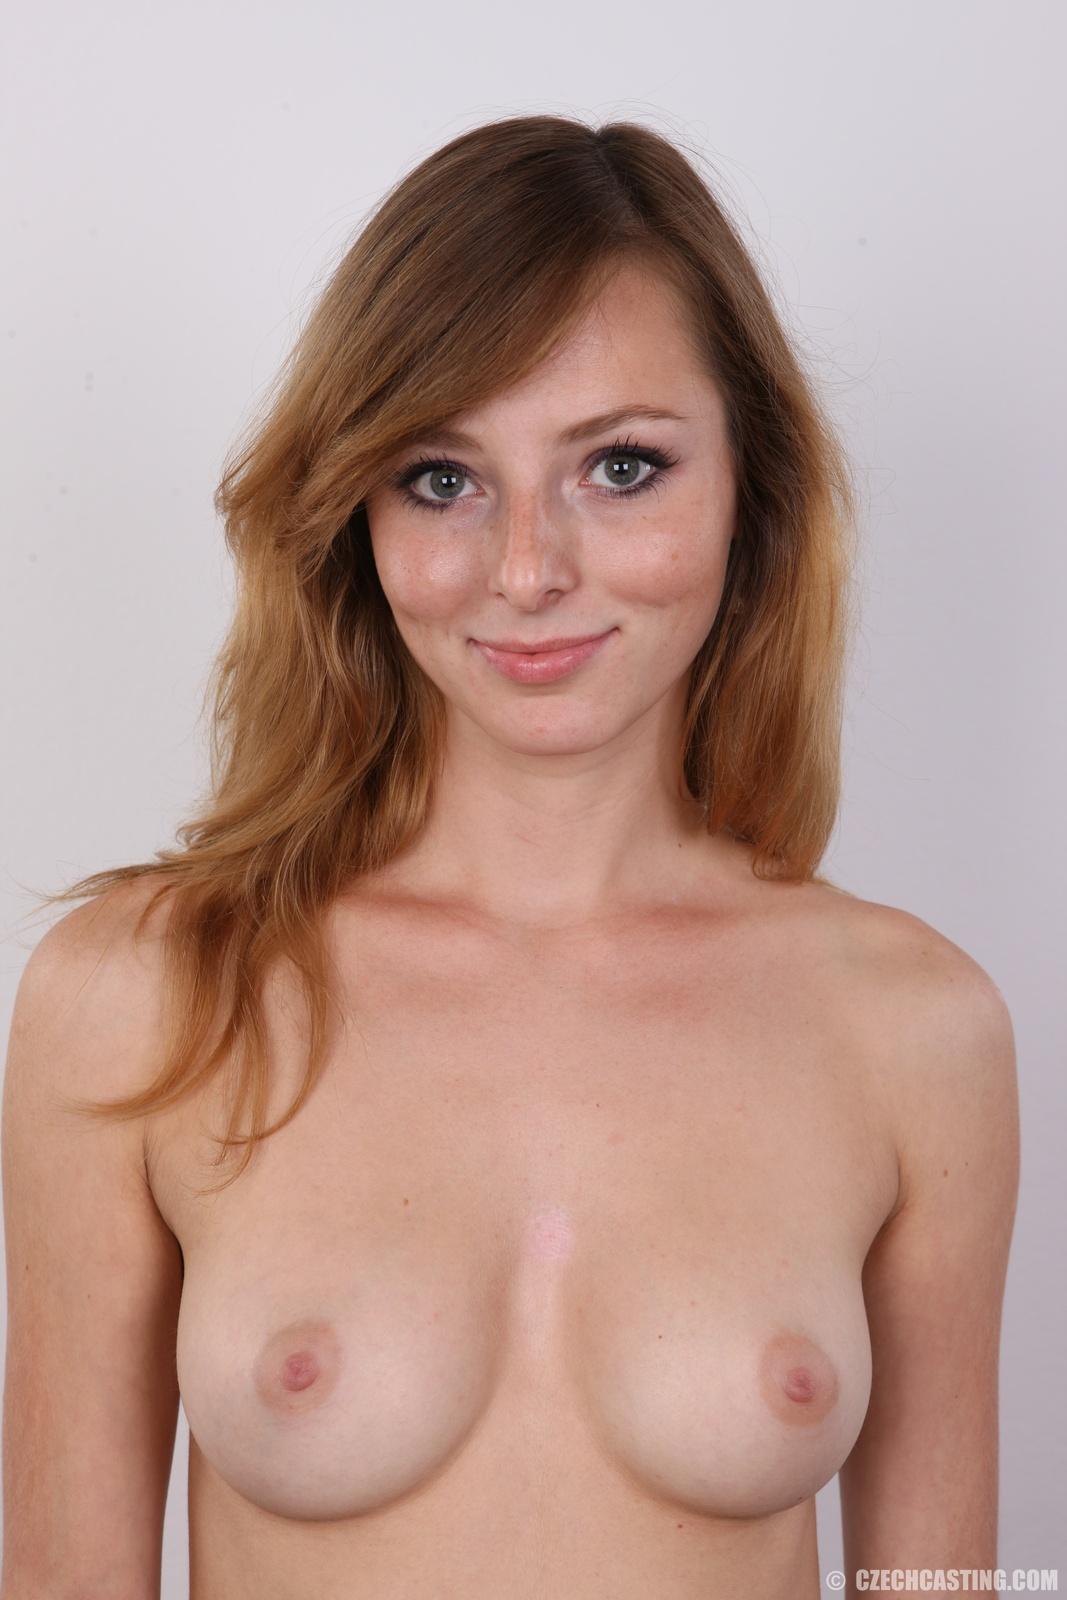 large chubby naked boobies